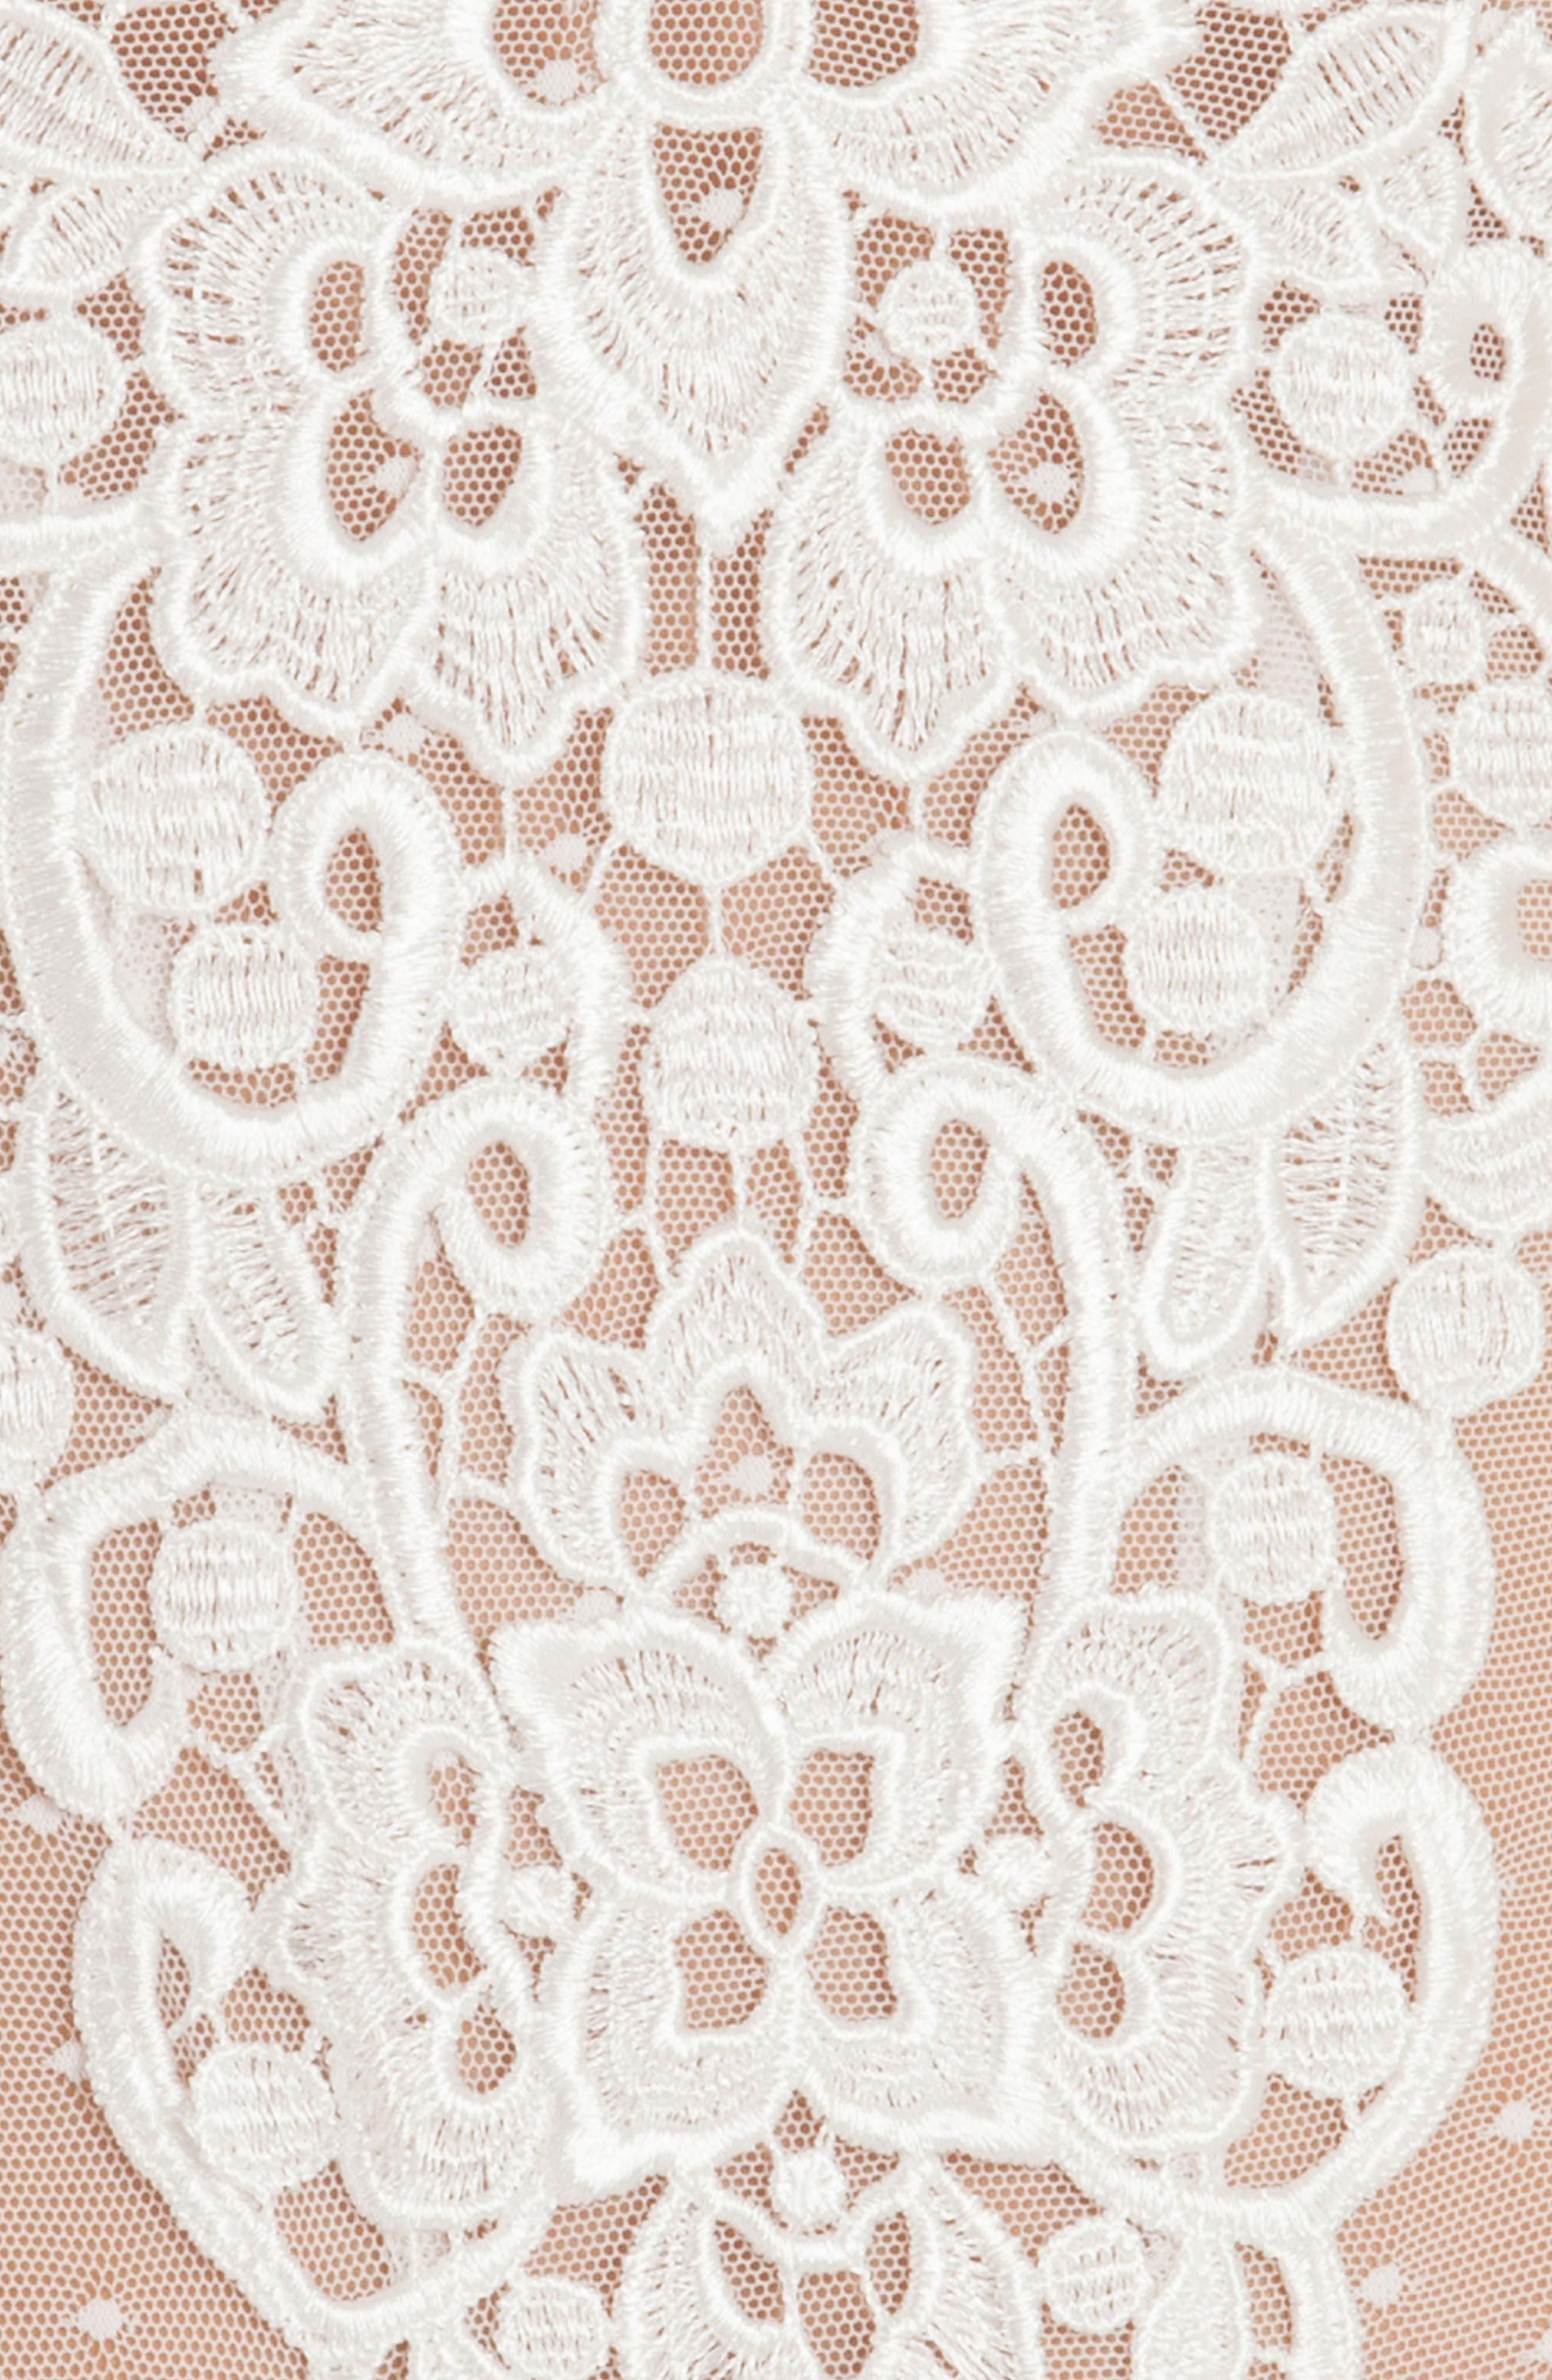 Byzantine Lace & Mesh Teddy,                             Alternate thumbnail 8, color,